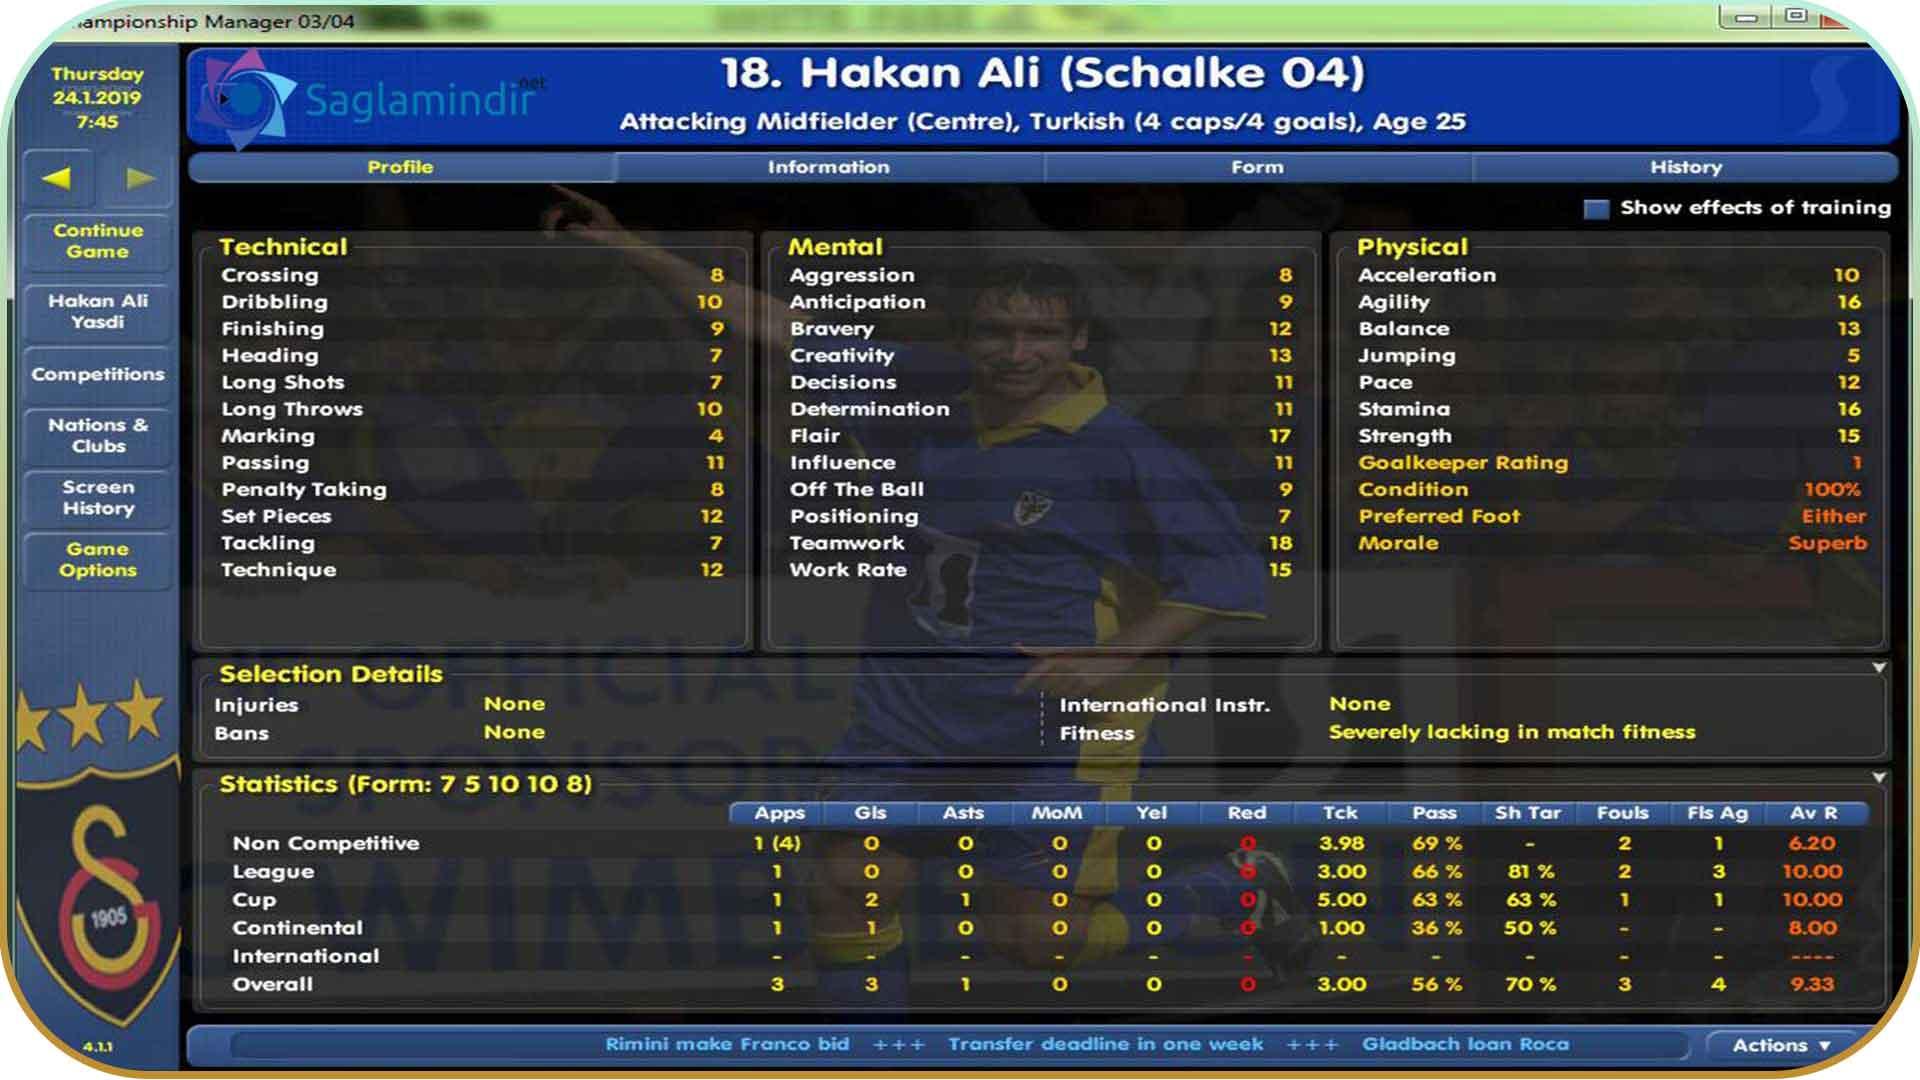 Championship Manager 03-04 full indir